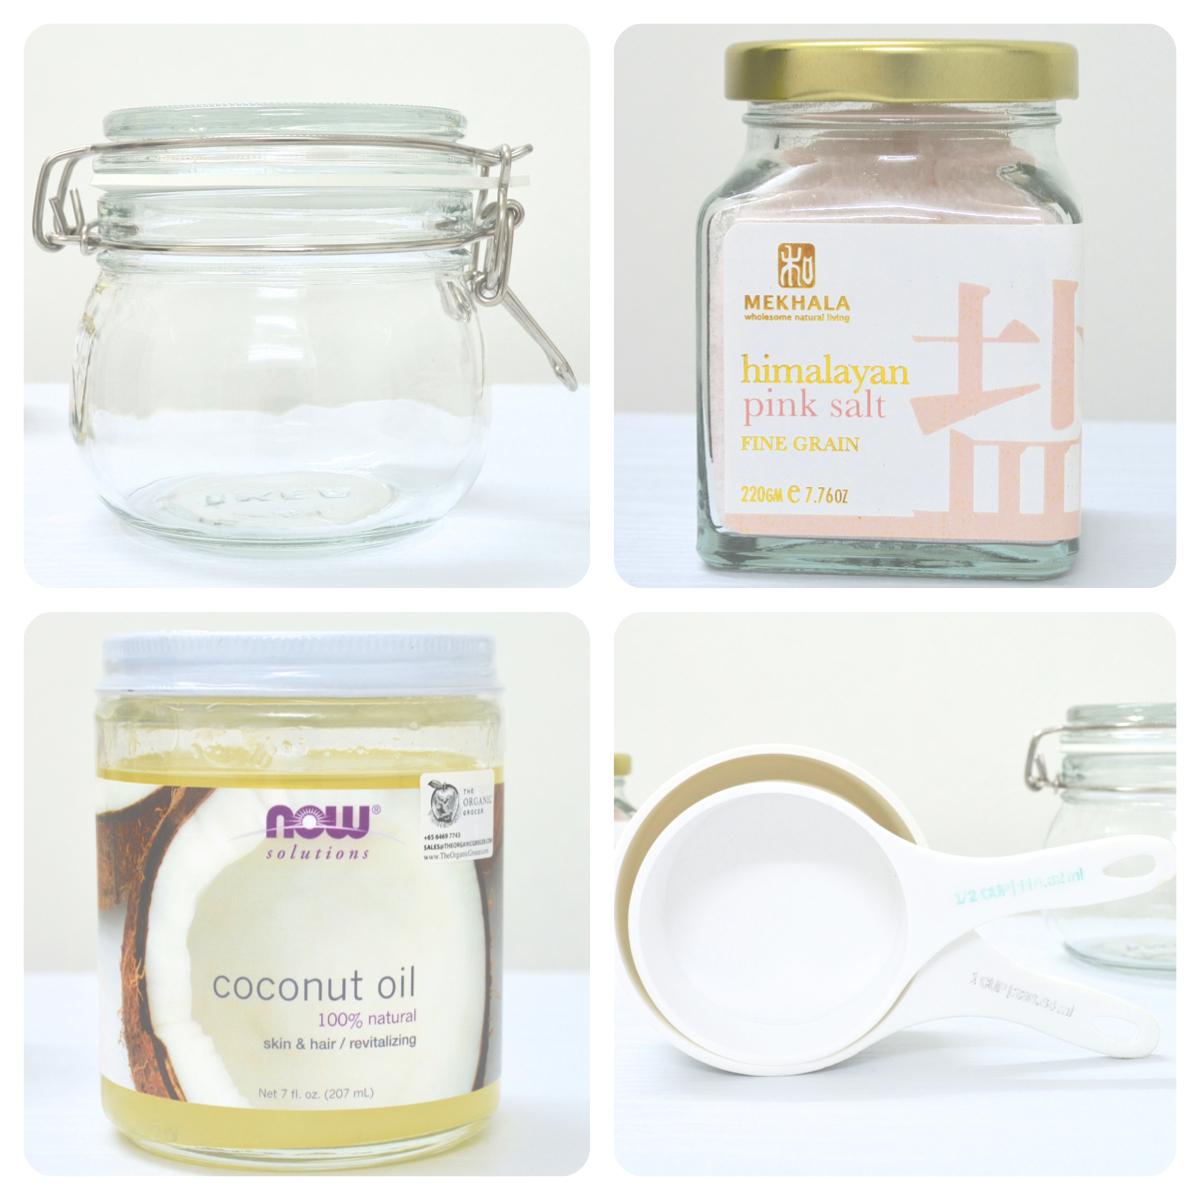 Salt and Coconut Oil Face Scrub Recipe